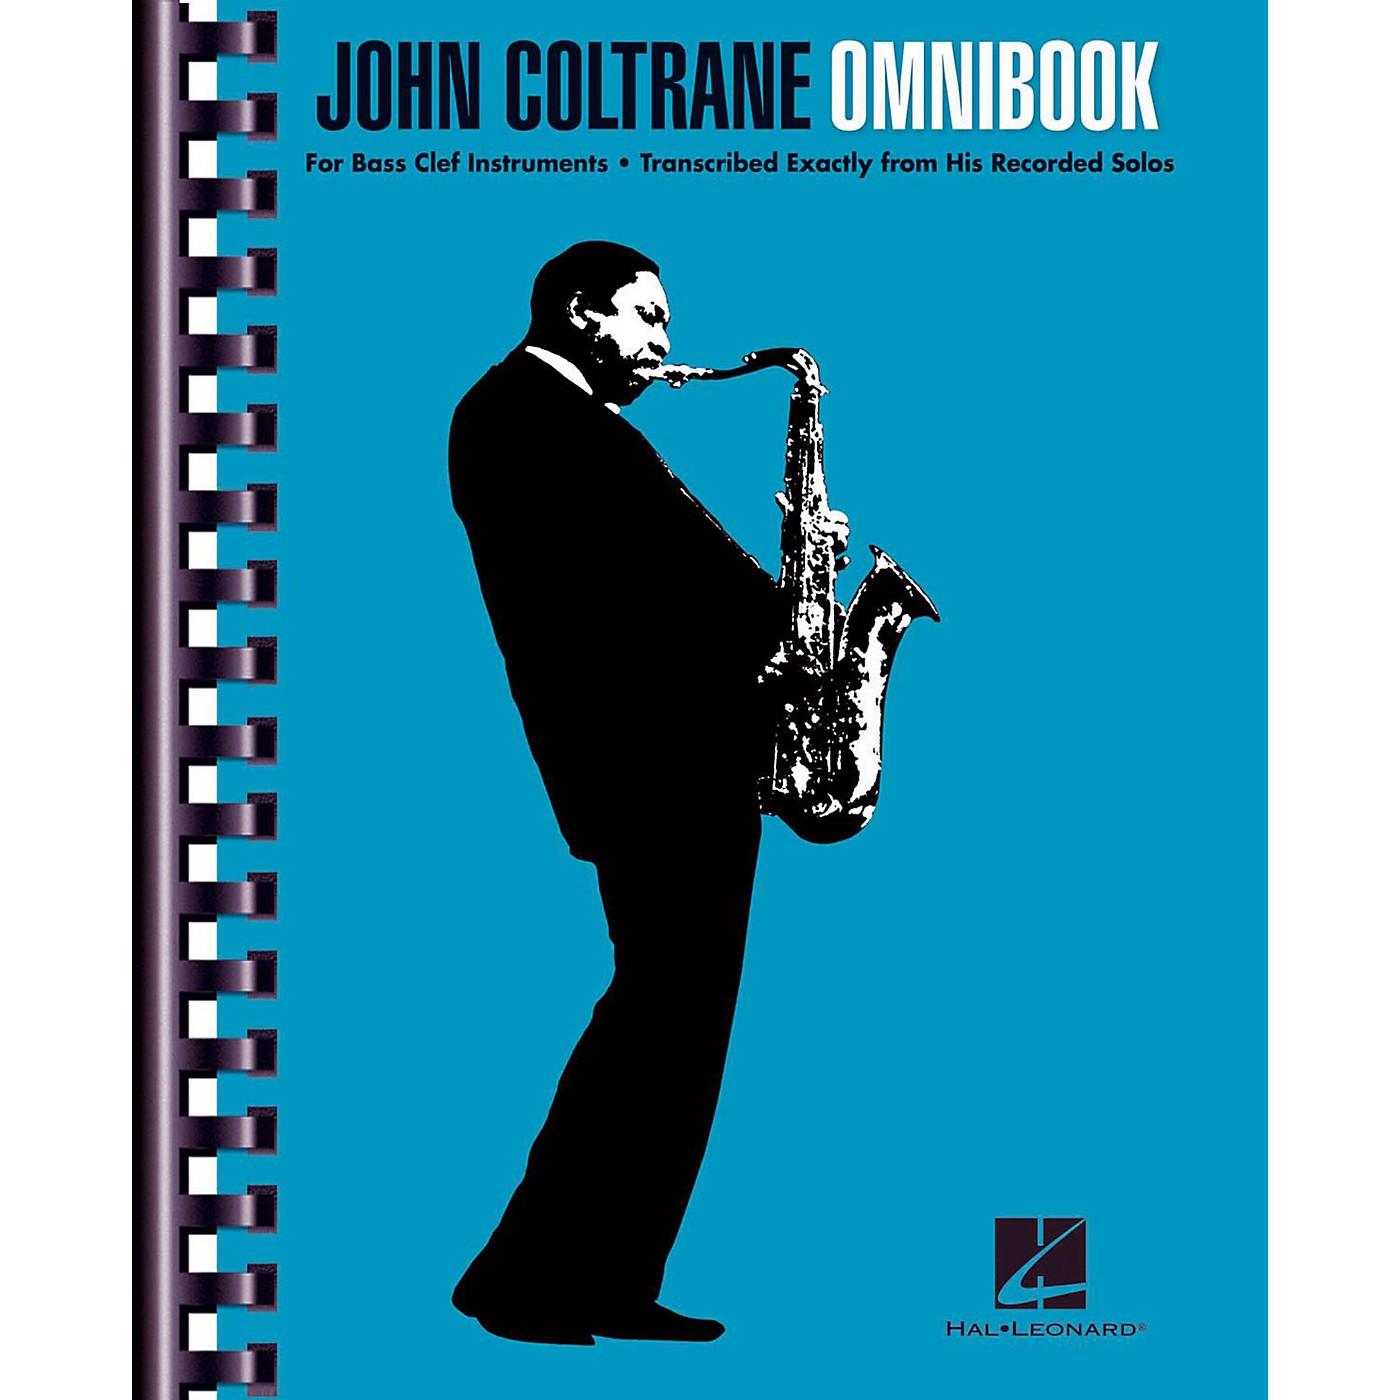 Hal Leonard John Coltrane Omnibook For Bass Clef Instruments thumbnail